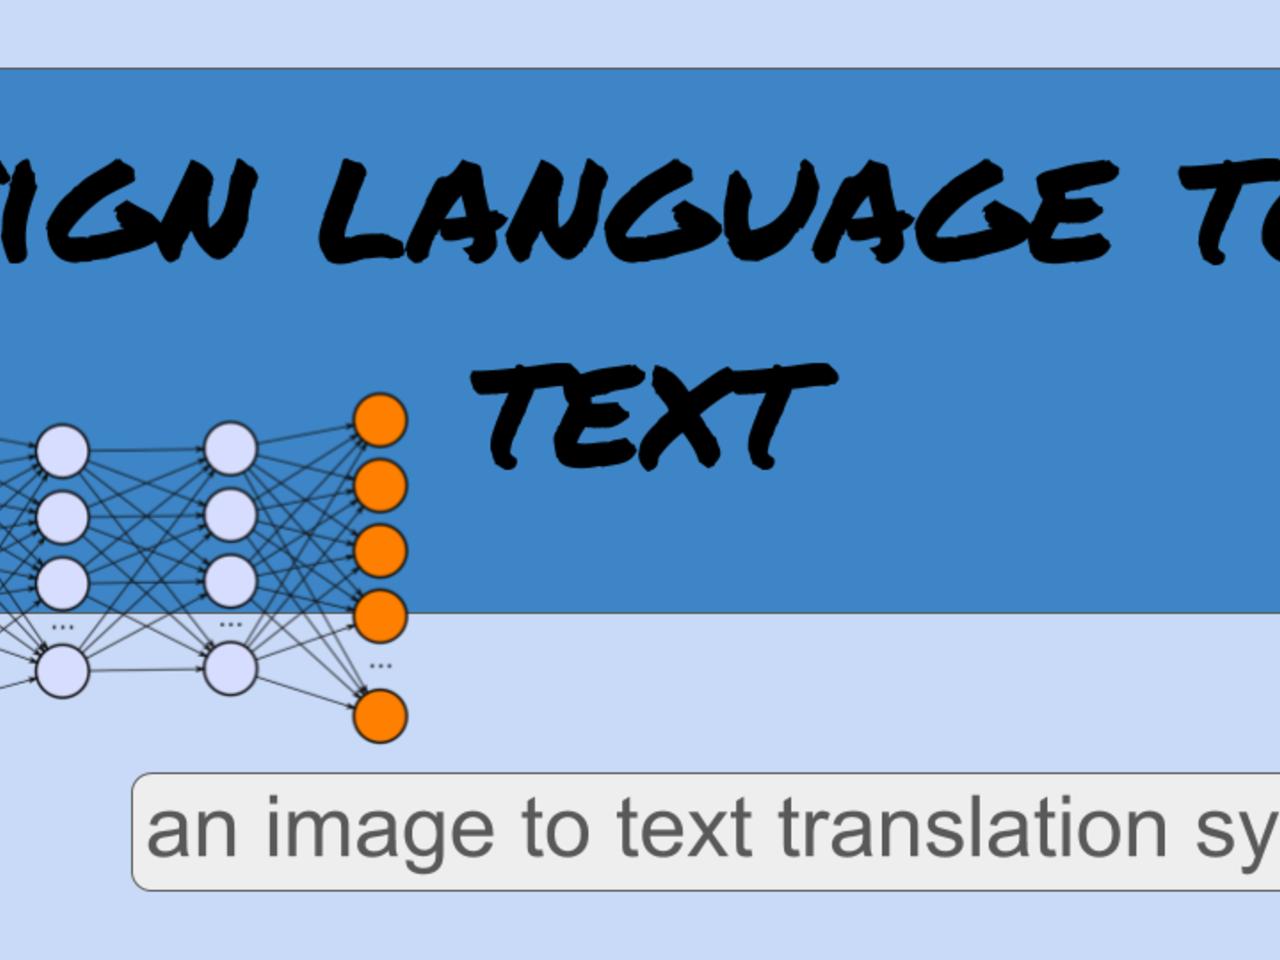 Sign language text translation